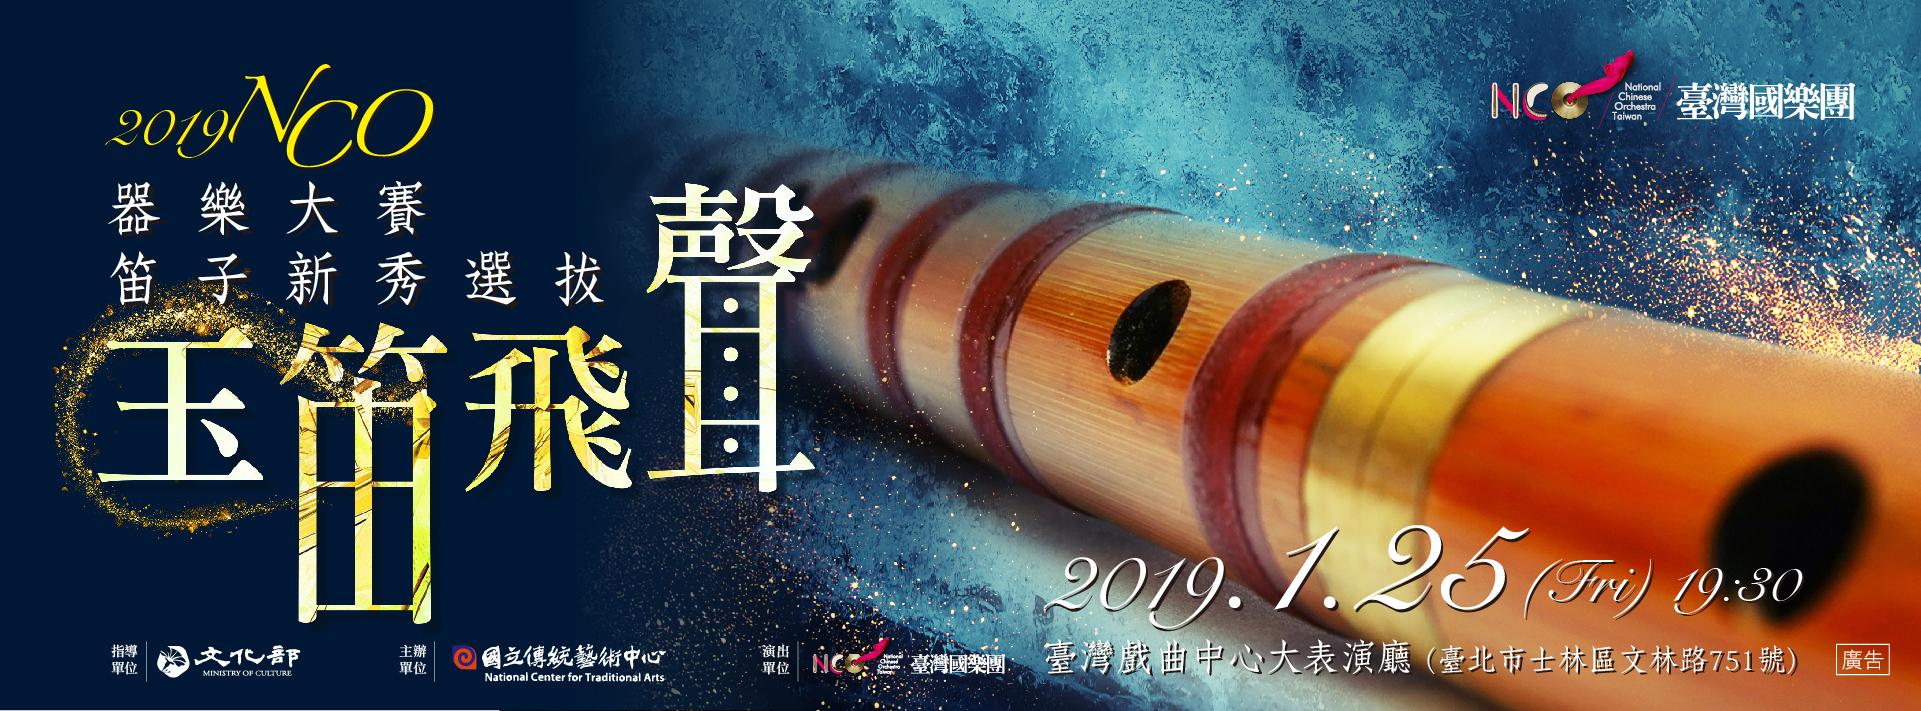 NCO20190125《NCO器樂大賽─2019玉笛飛聲新秀選拔》[另開新視窗]